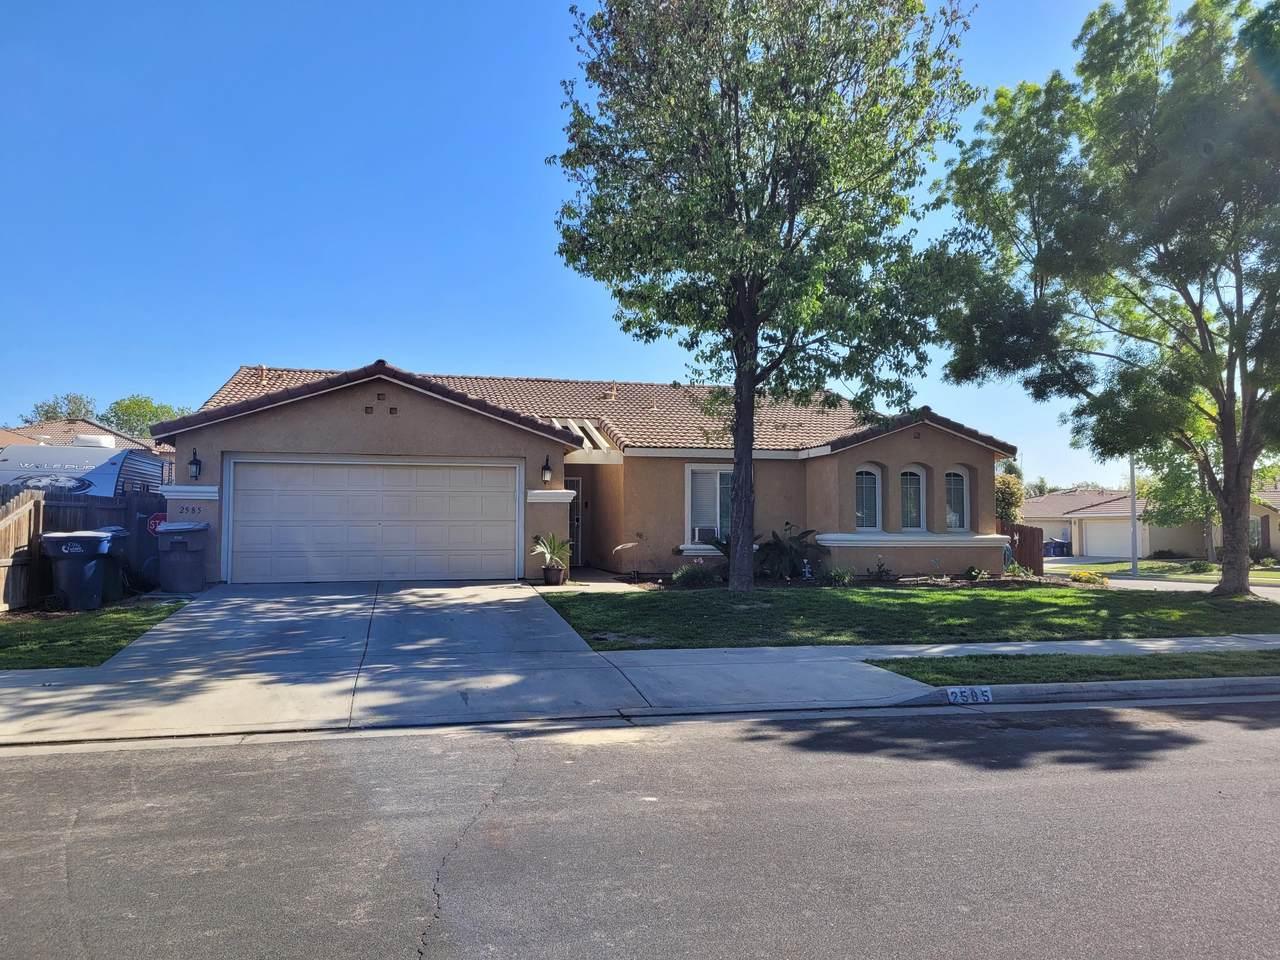 2585 Tecopa Avenue - Photo 1